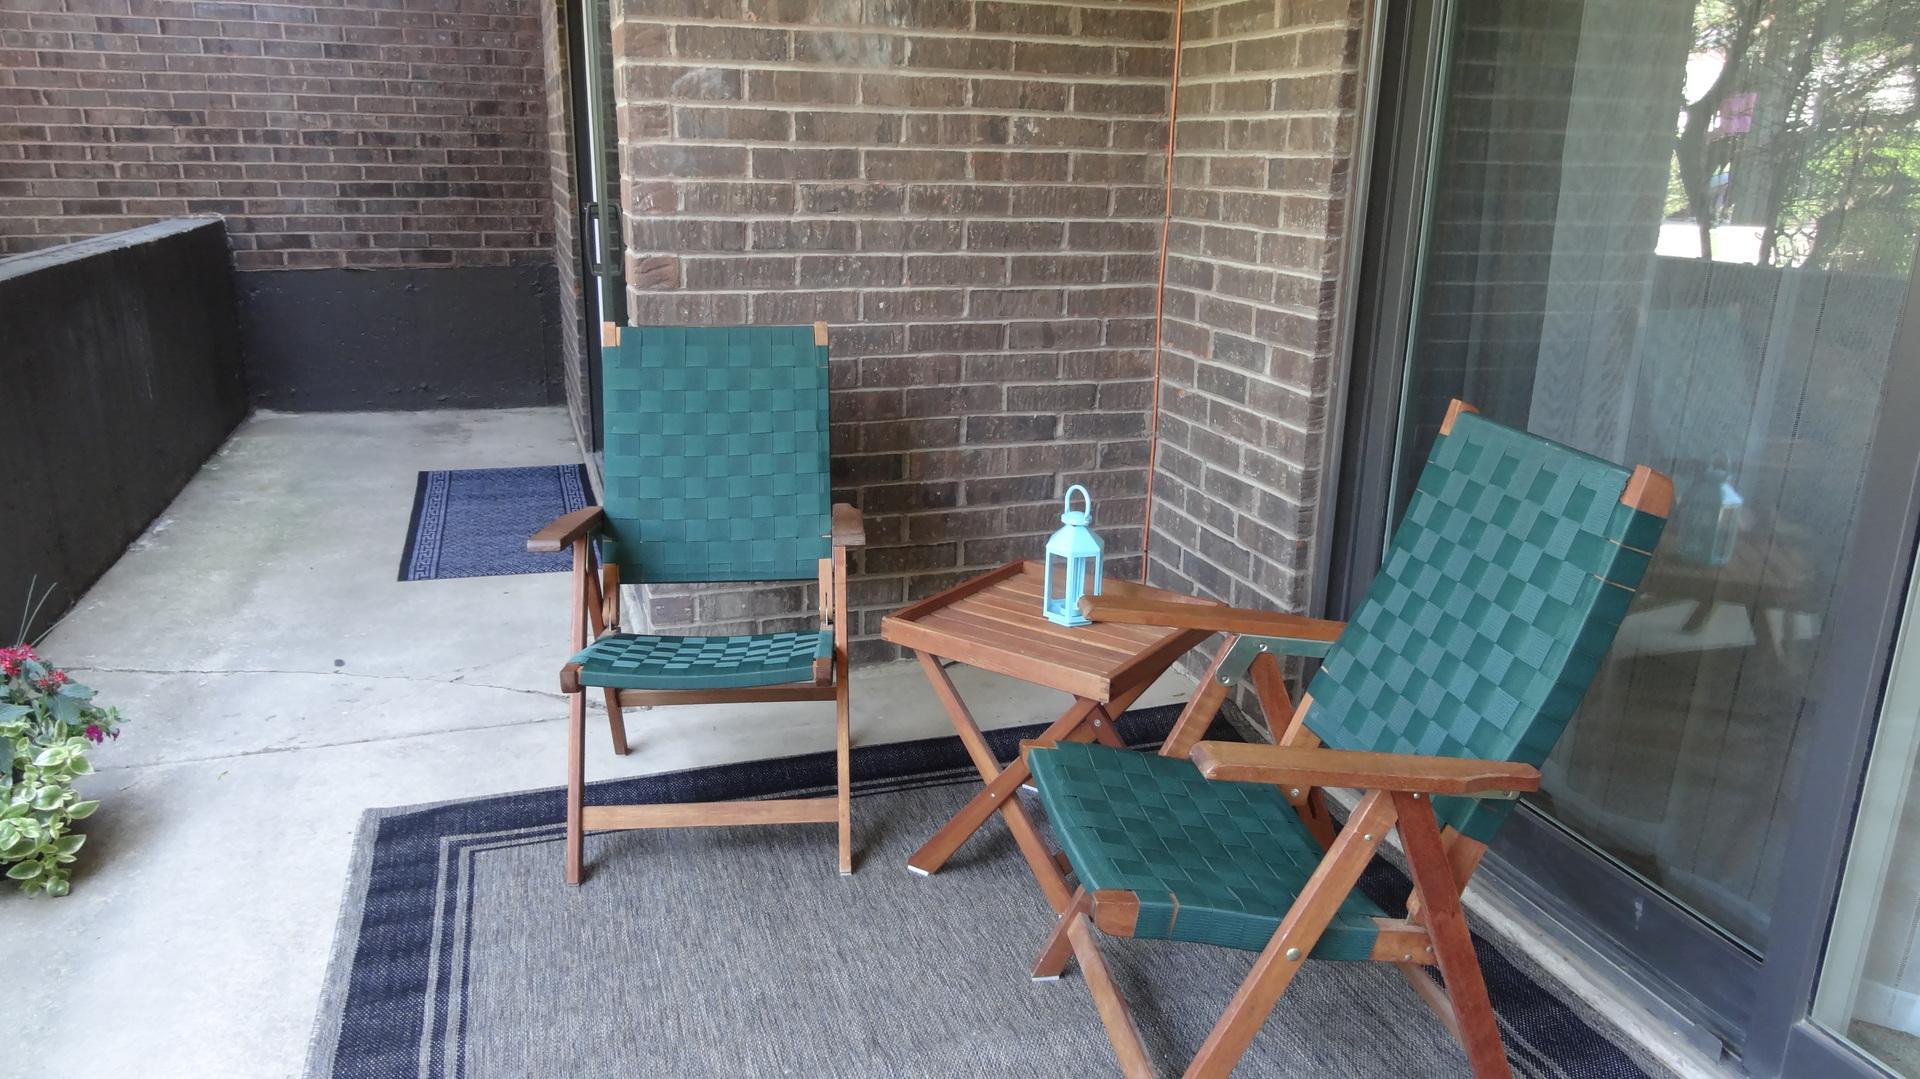 491 Timber Ridge 104, Carol Stream, Illinois, 60188